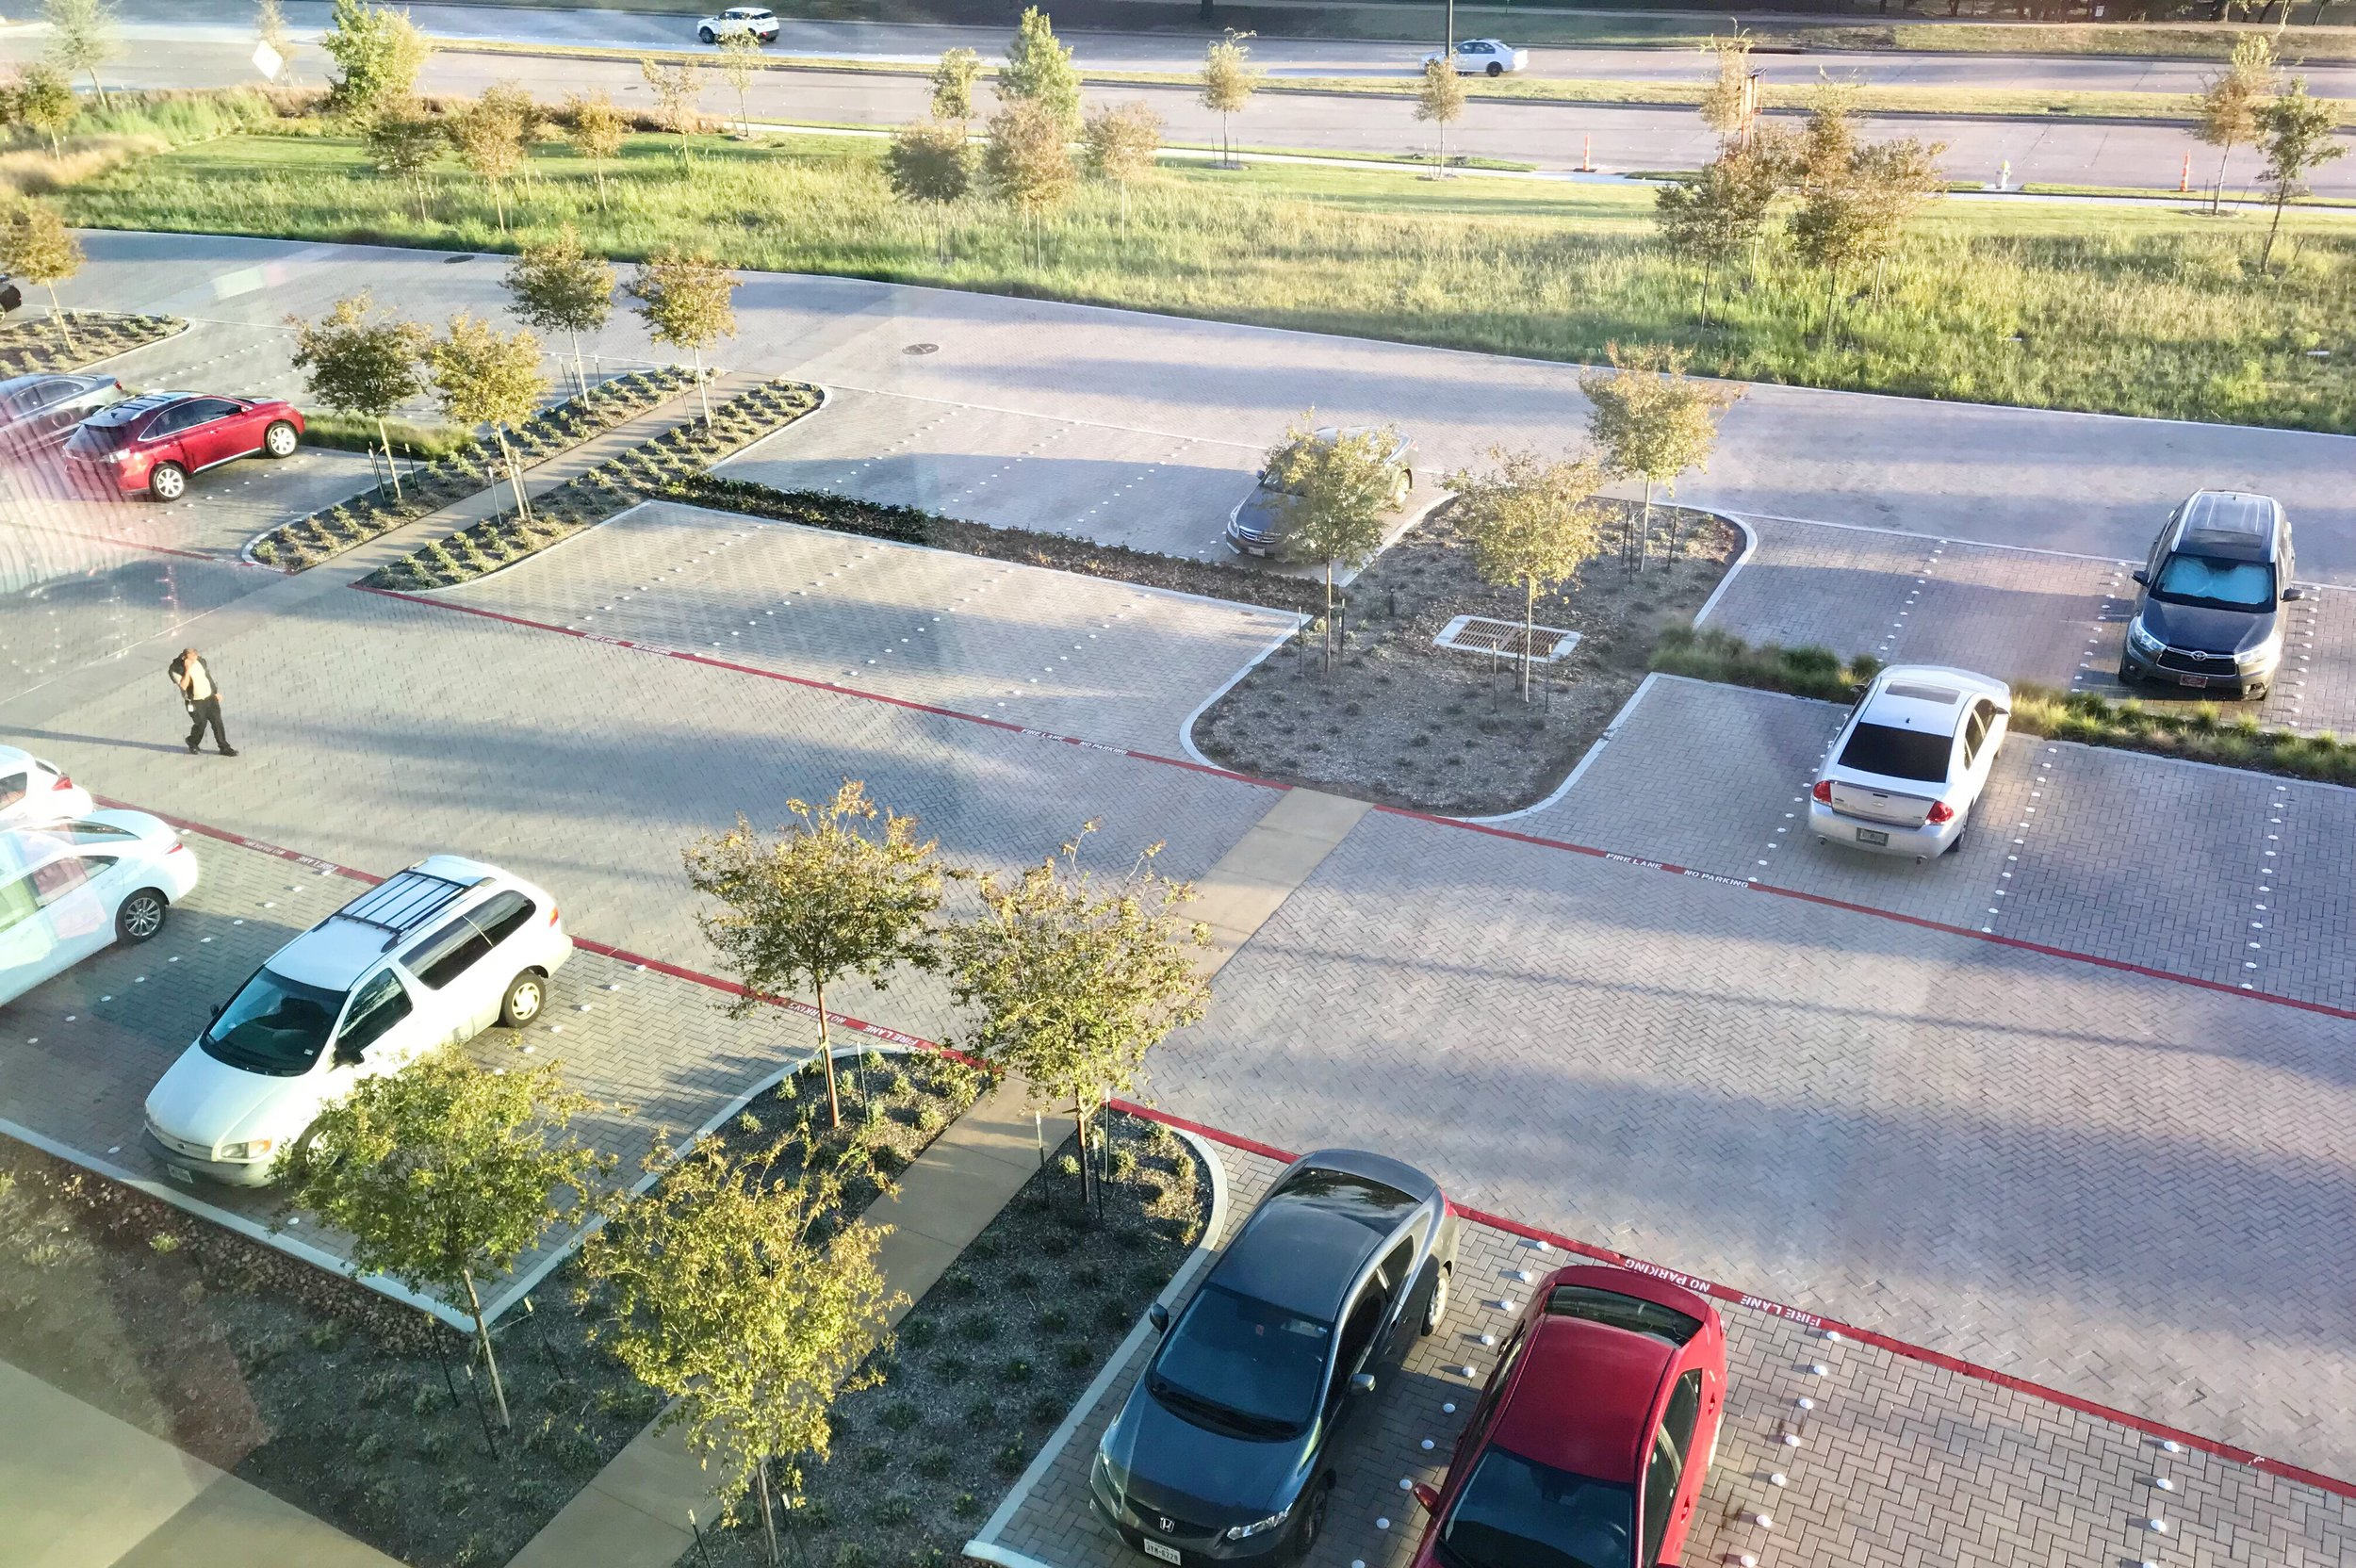 Guest parking lot at entrance